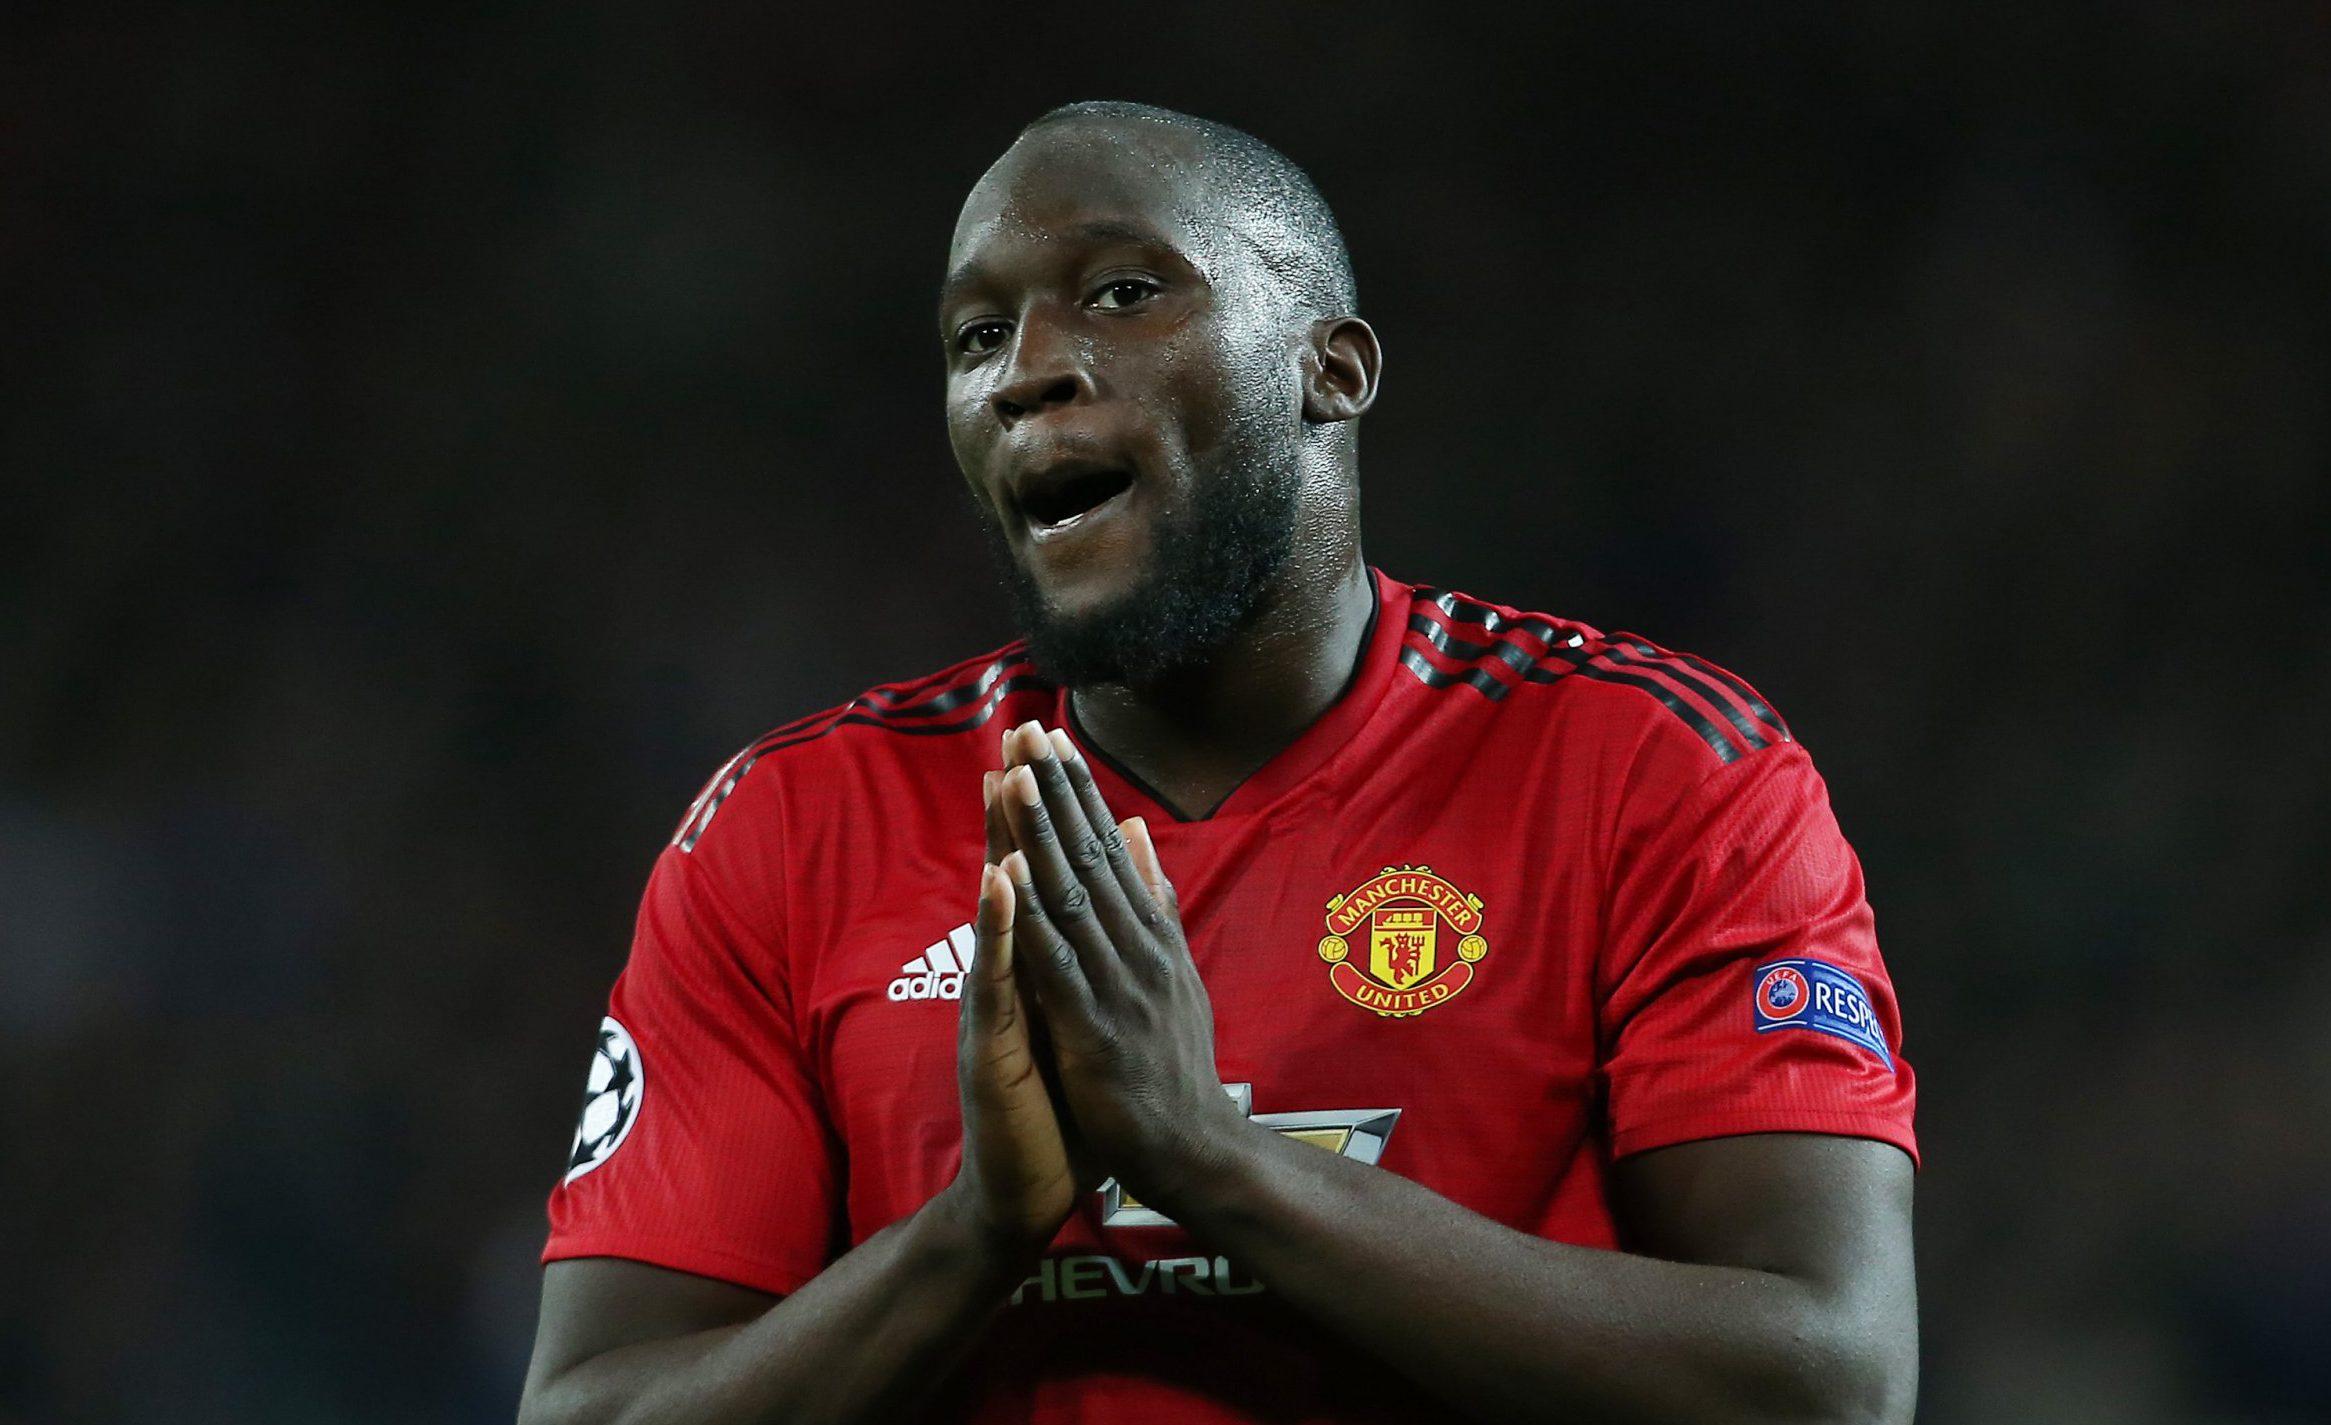 Manchester United fans BEG Jose Mourinho to drop 'embarrassing' Romelu Lukaku for Everton clash